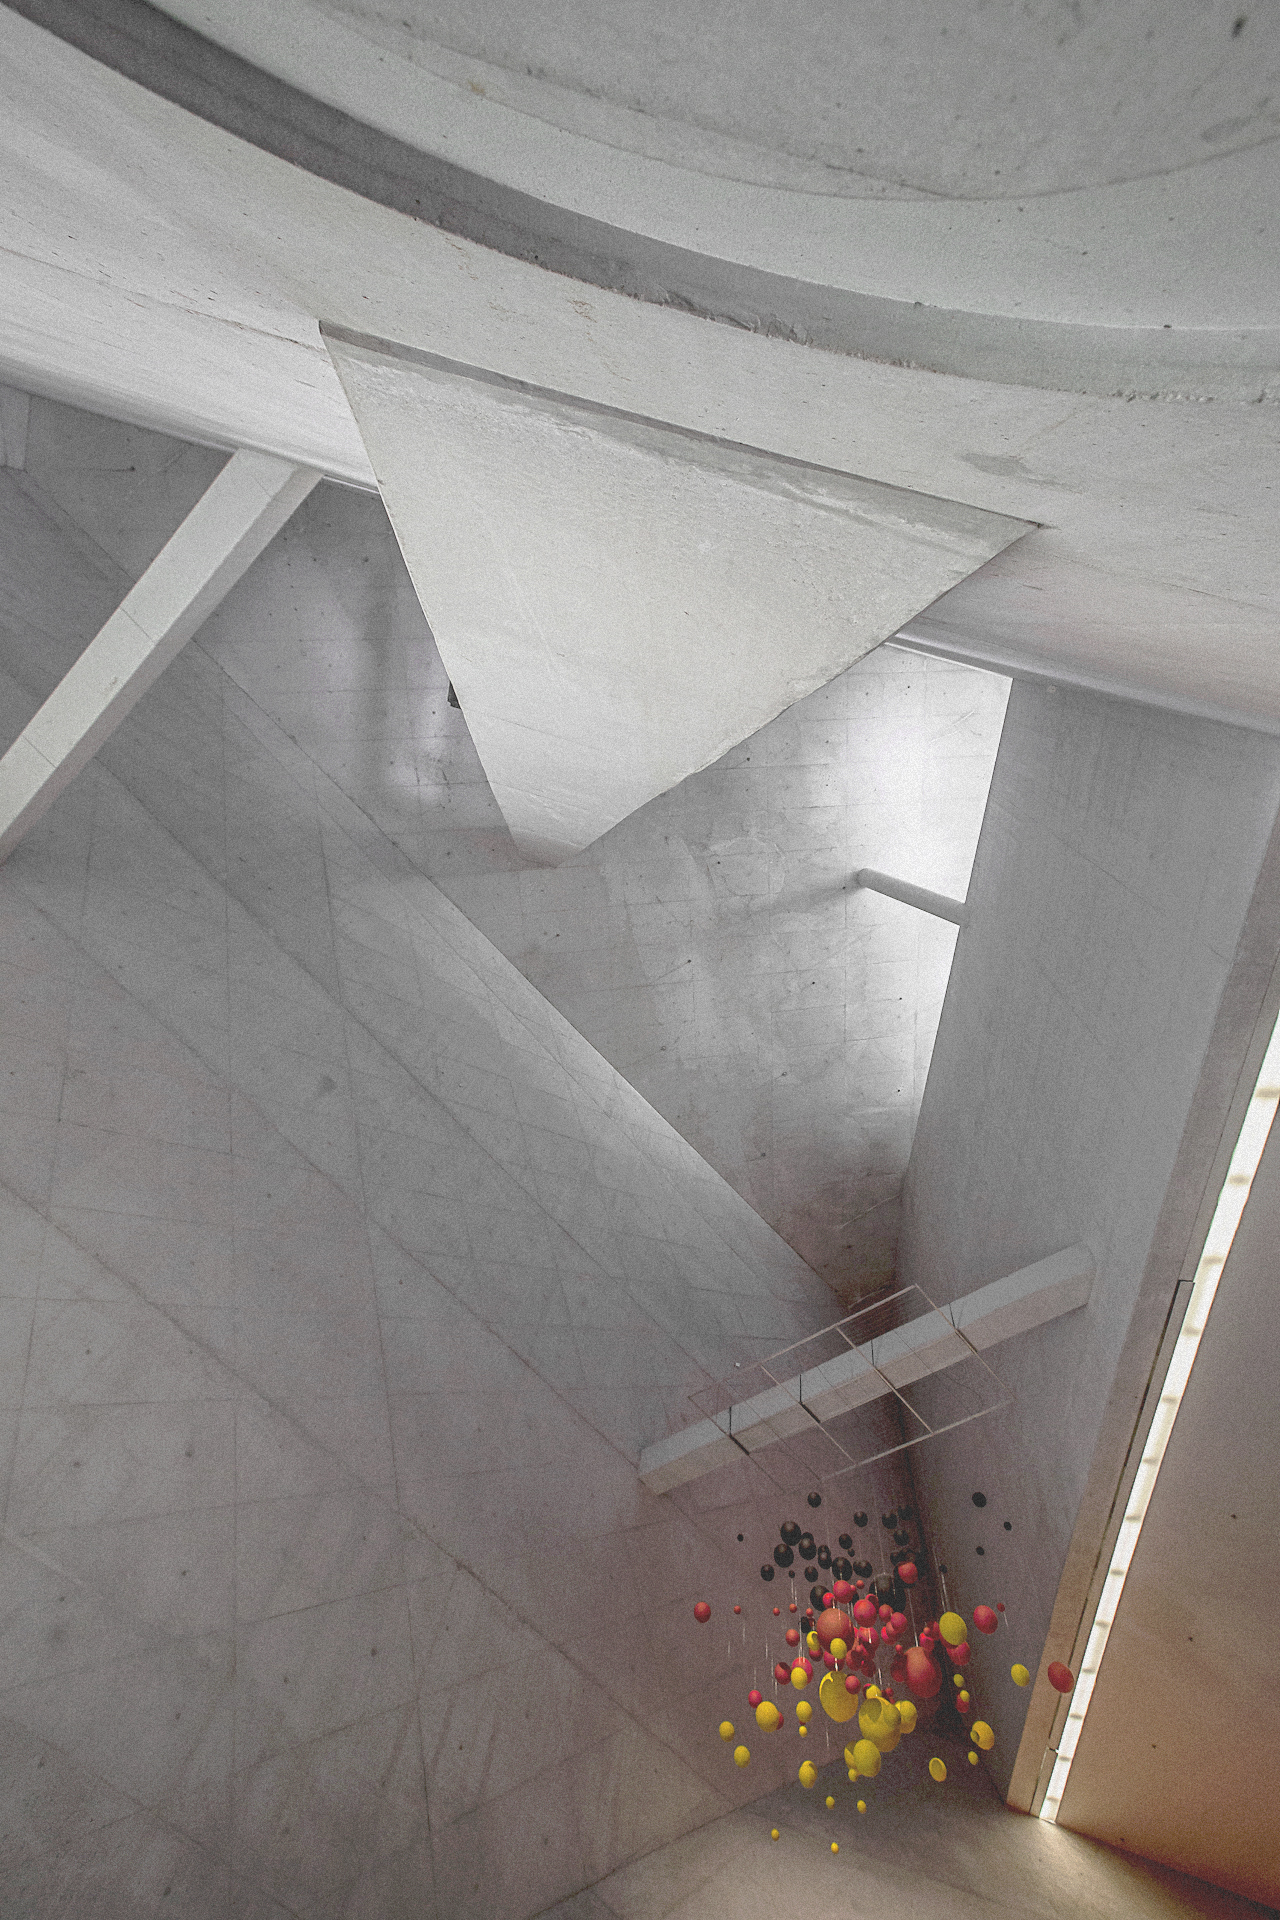 10-Aniversario-Casa-da-Musica-Porto-Reportagem-Fotografica-Photographic-Coverage-Fotografia-Photography-Arquitectura-Architecture-Rem-Koolhaas-bonjourmolotov-34N2.jpg